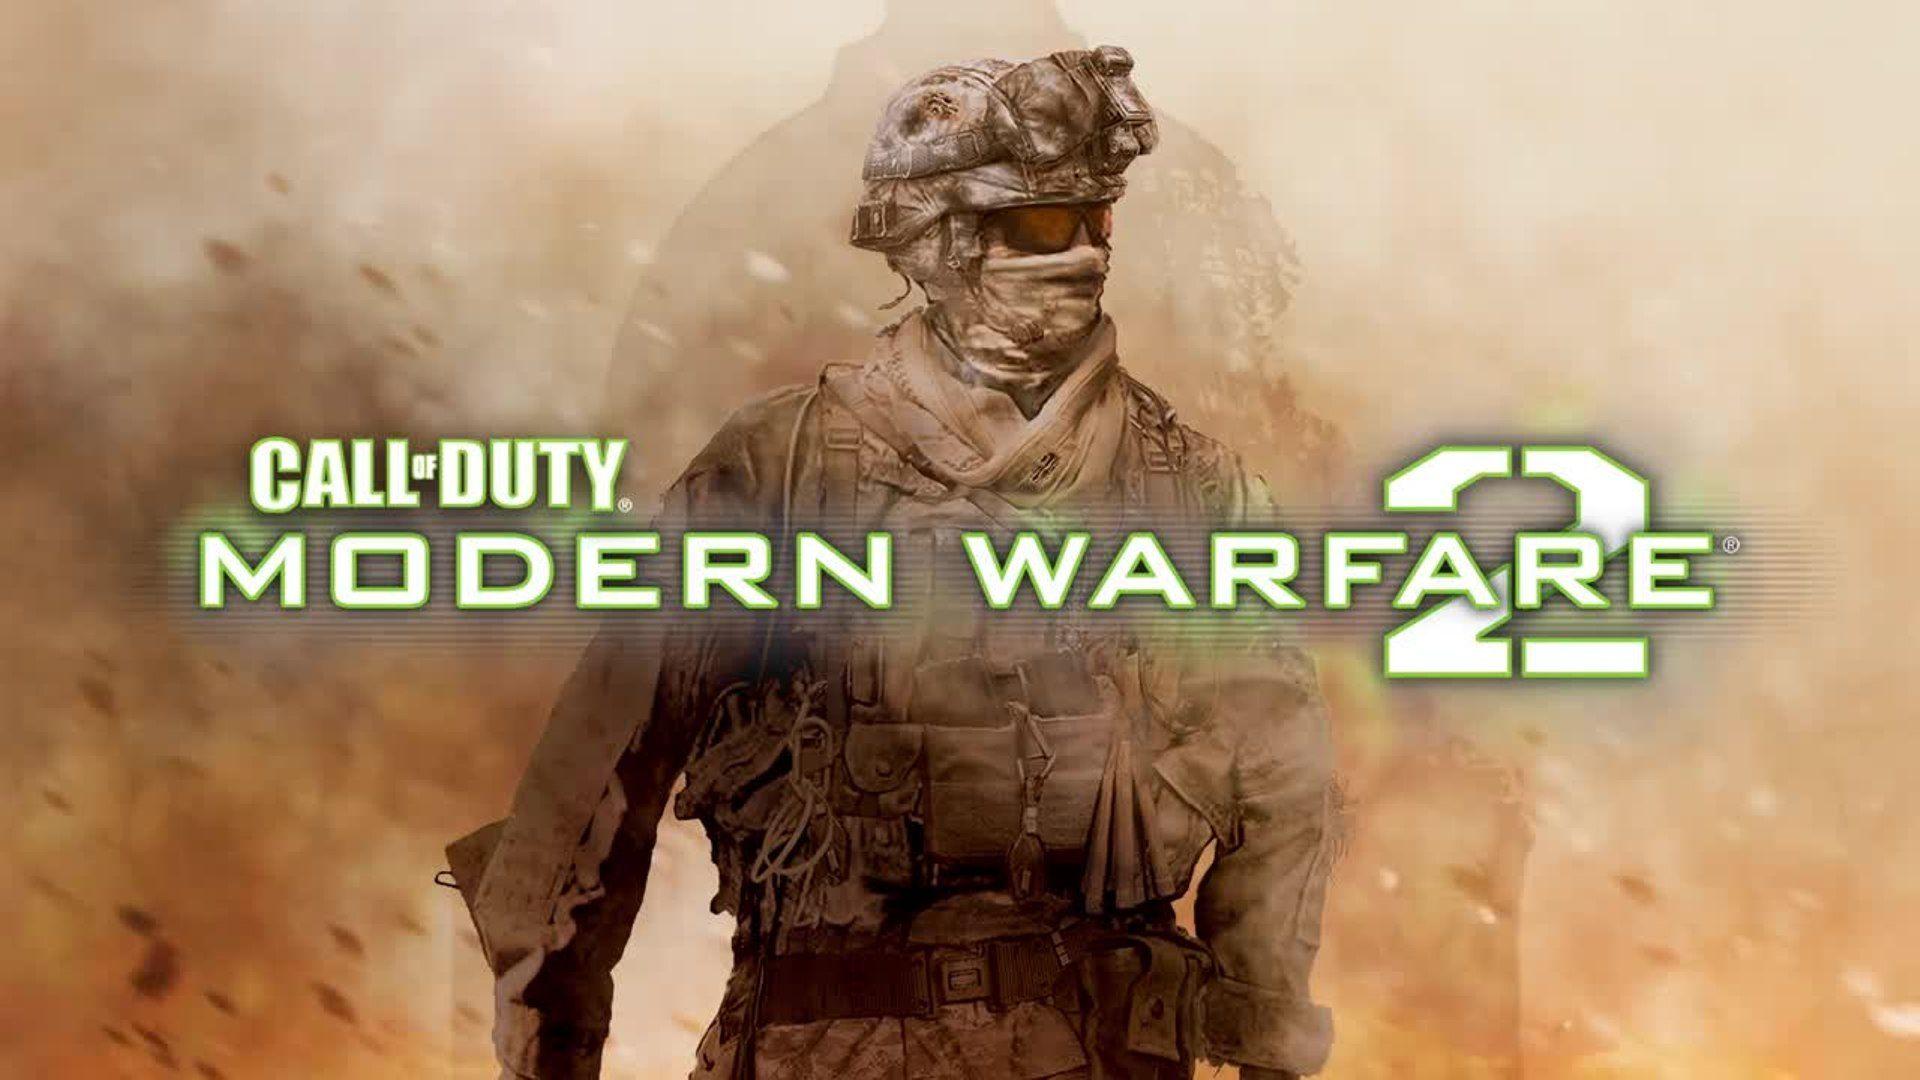 Call of Duty Modern Warfare 2 Title Screen